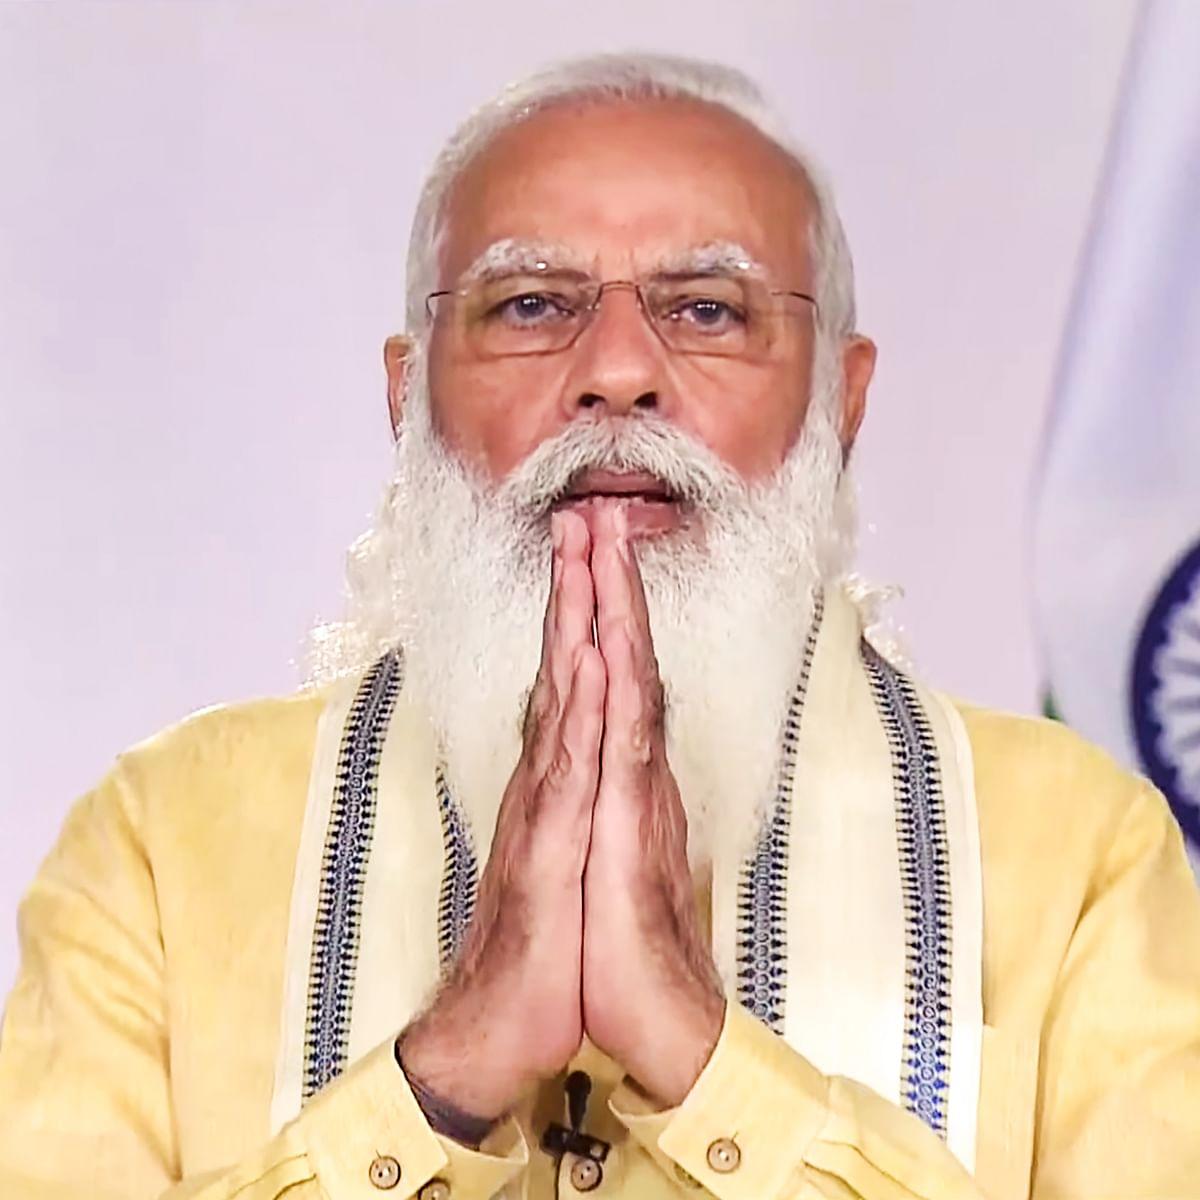 PM Modi to address virtual high-level UN meet on desertification, land degradation, drought today